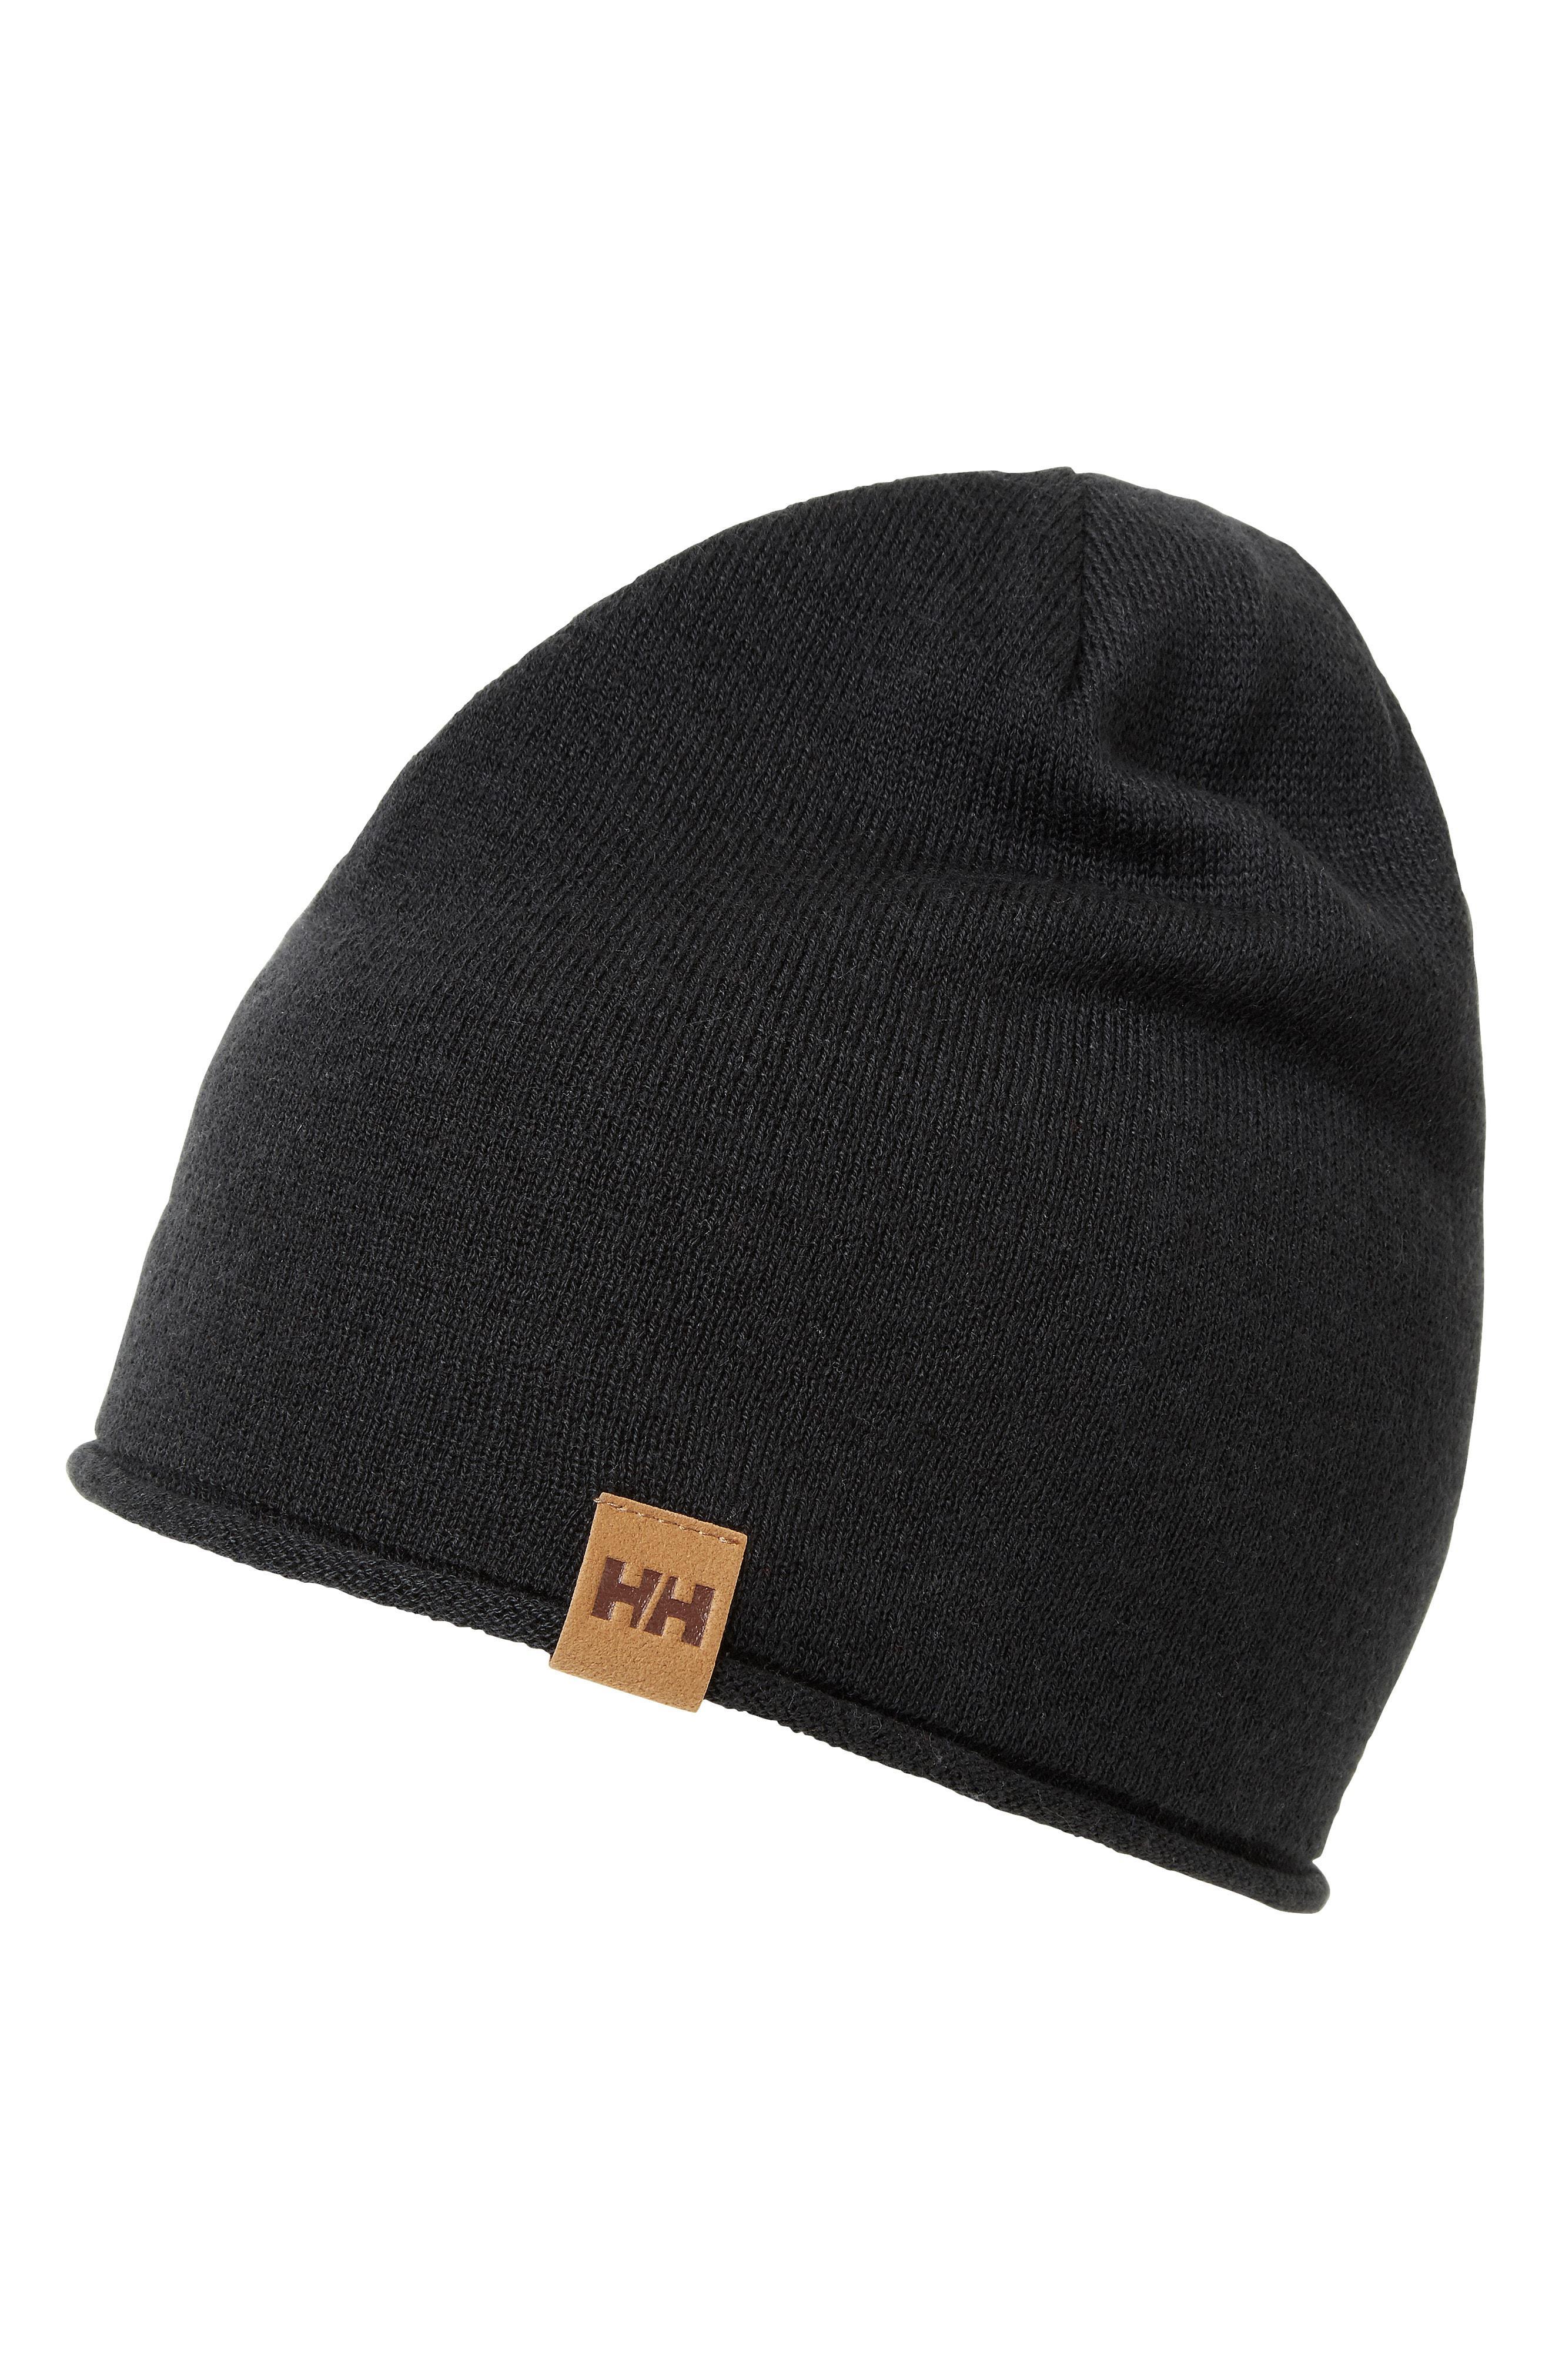 83beb0e23c1 Lyst - Helly Hansen Mountain Beanie in Black for Men